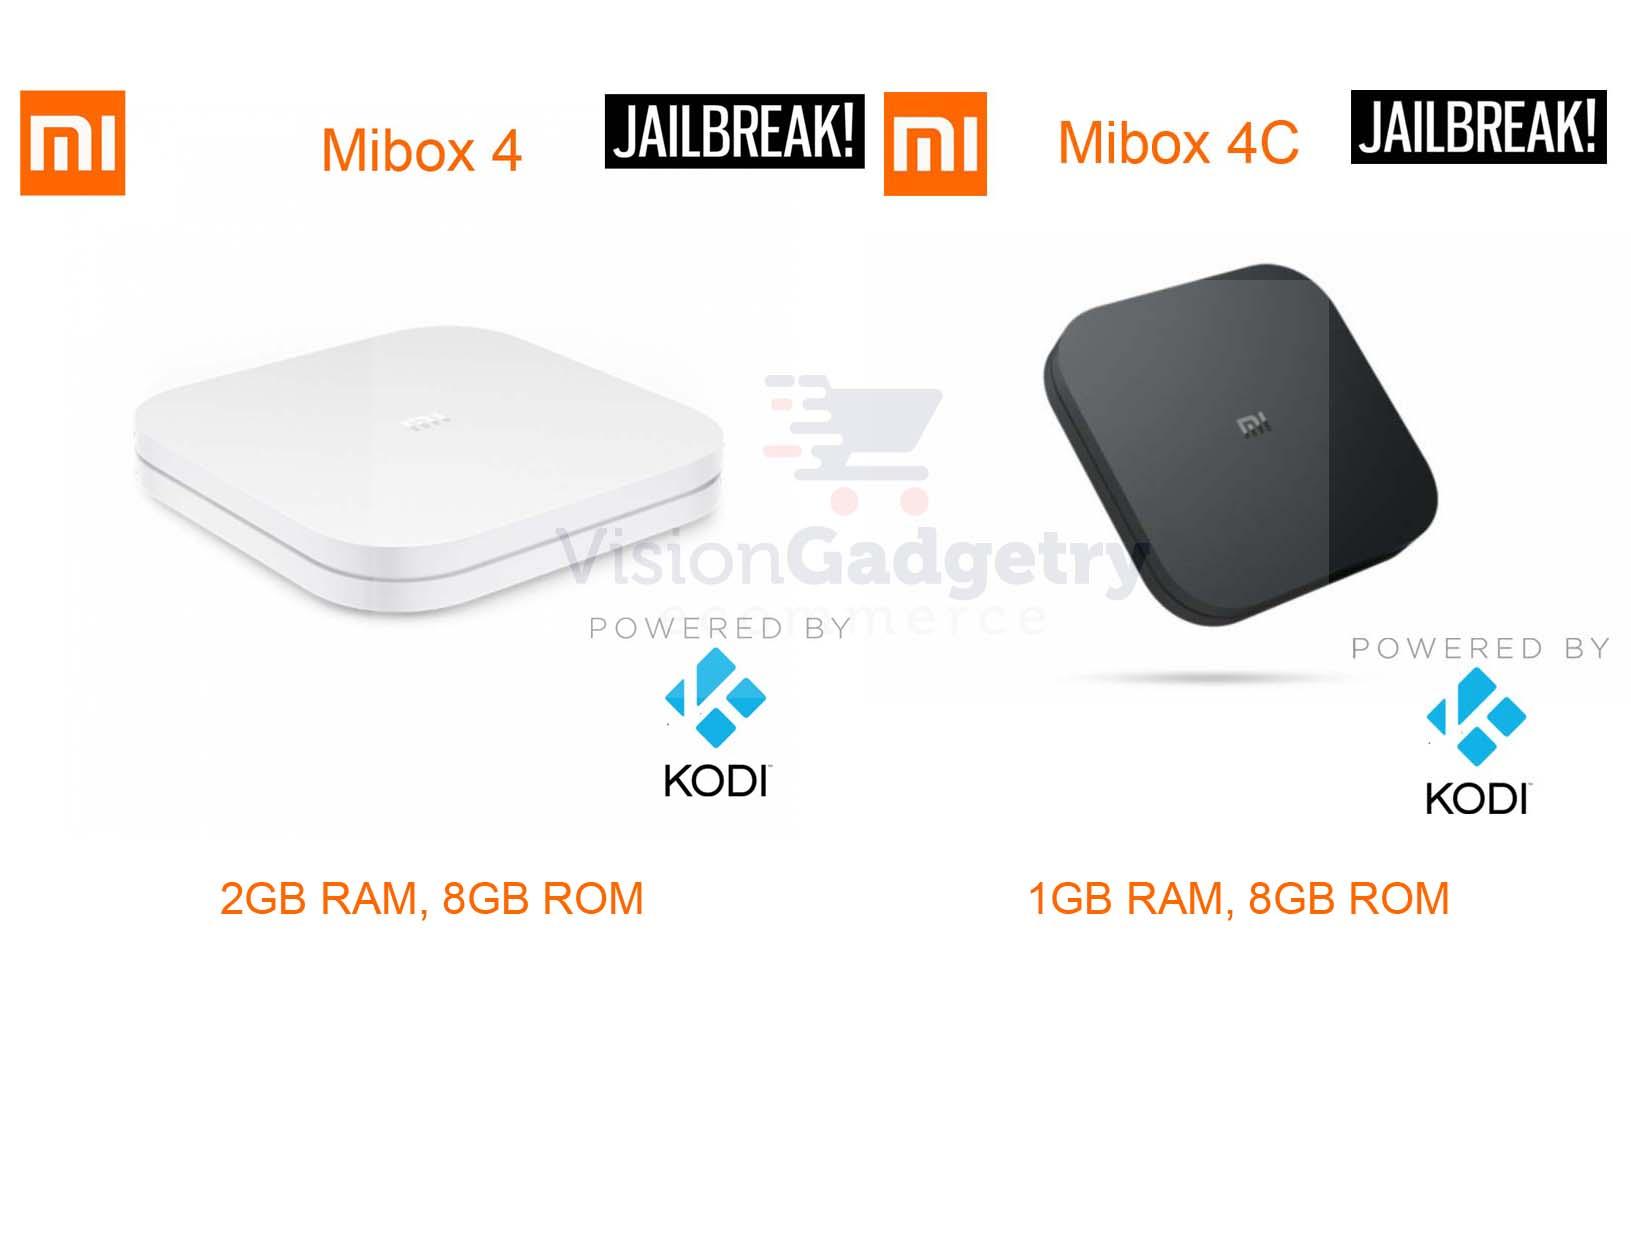 Xiaomi Mibox Box 4 4c 2018 64bit And End 182021 1200 Am